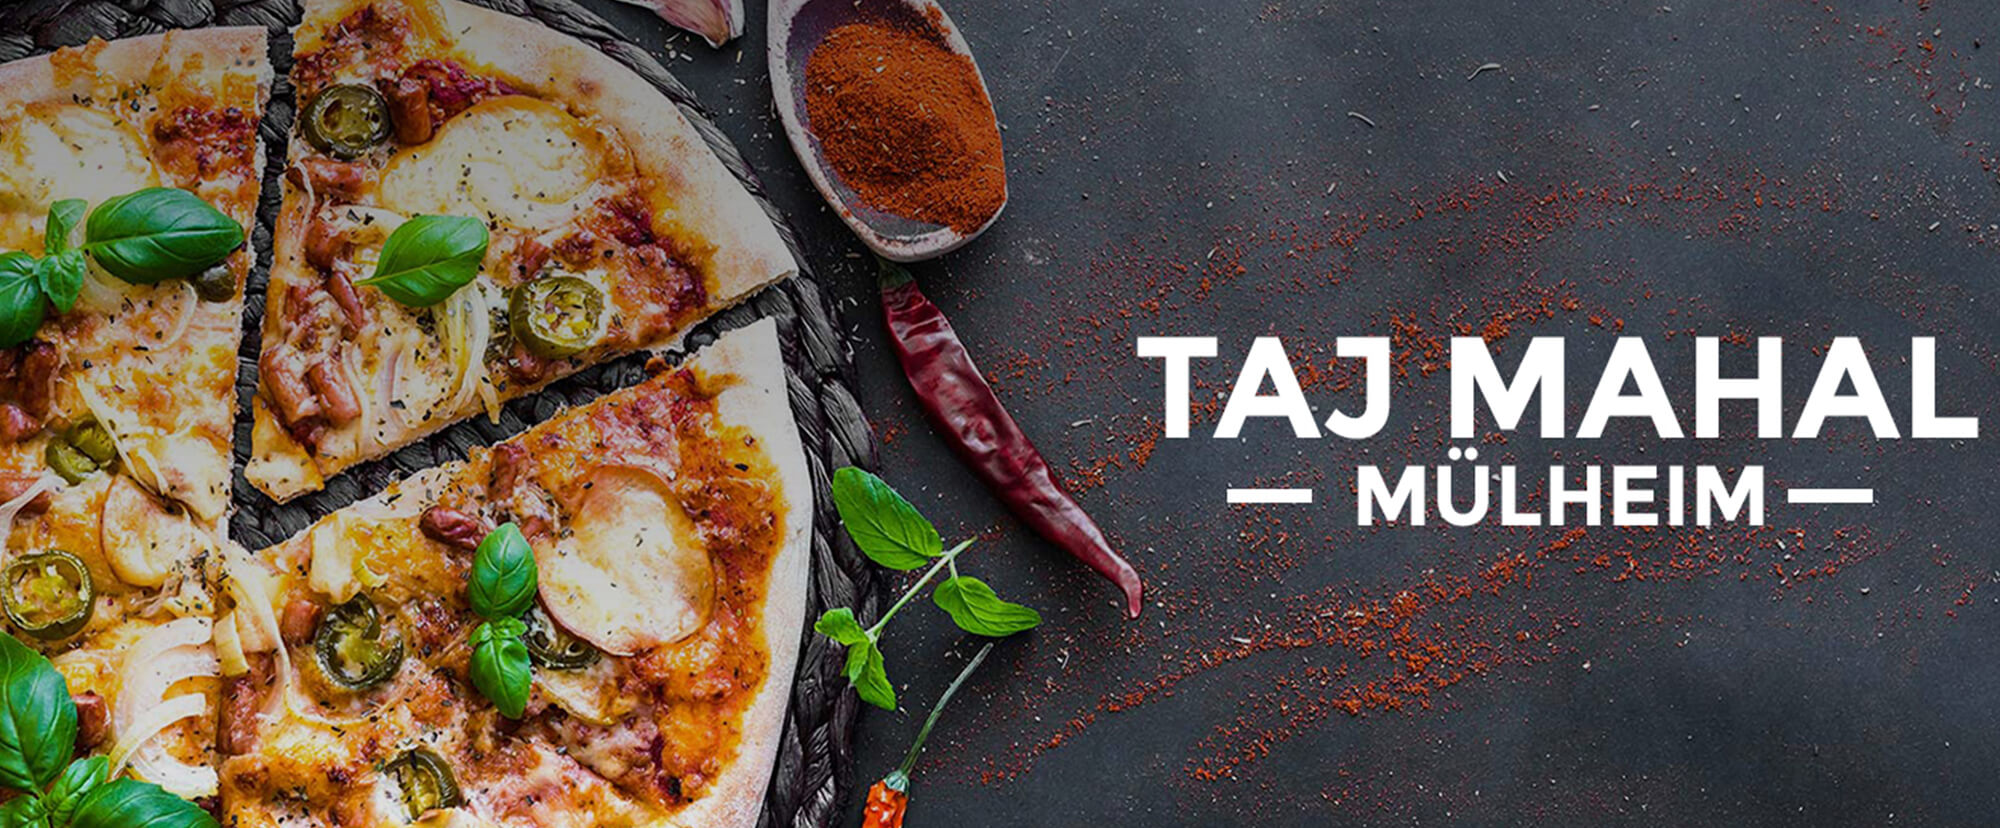 Brandcrock-Taj Mahal Restaurant-BrandCrock-portfolio-header img